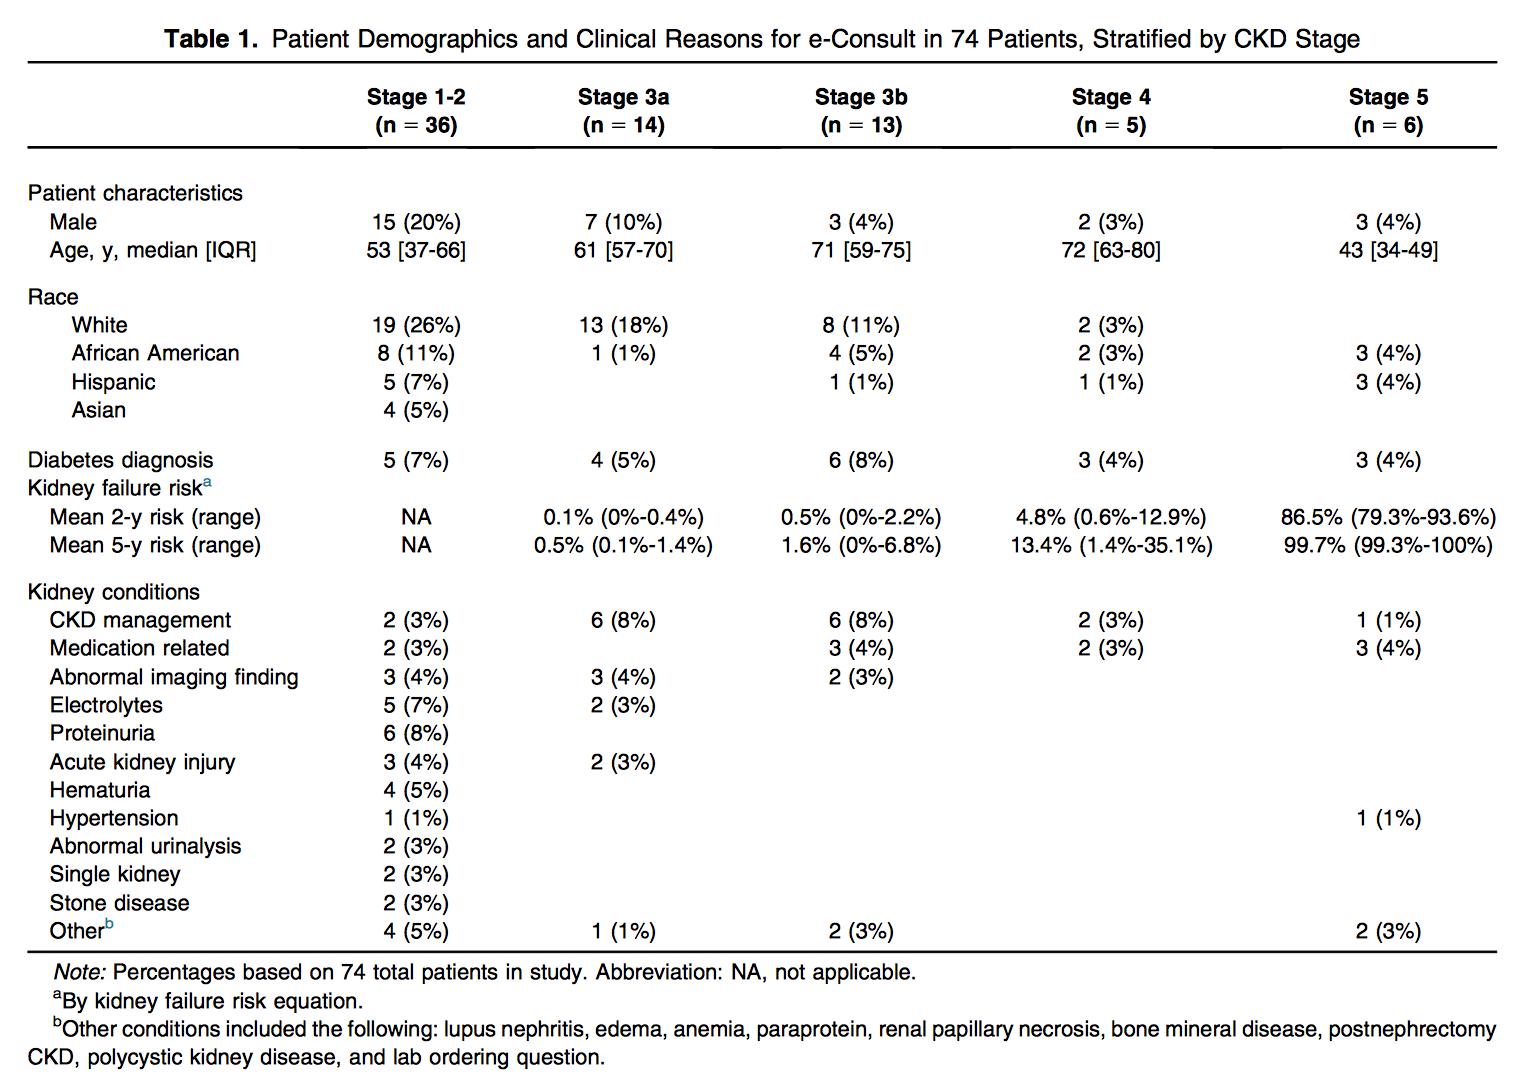 Table 1 from Mendu et al AJKD, © National Kidney Foundation.